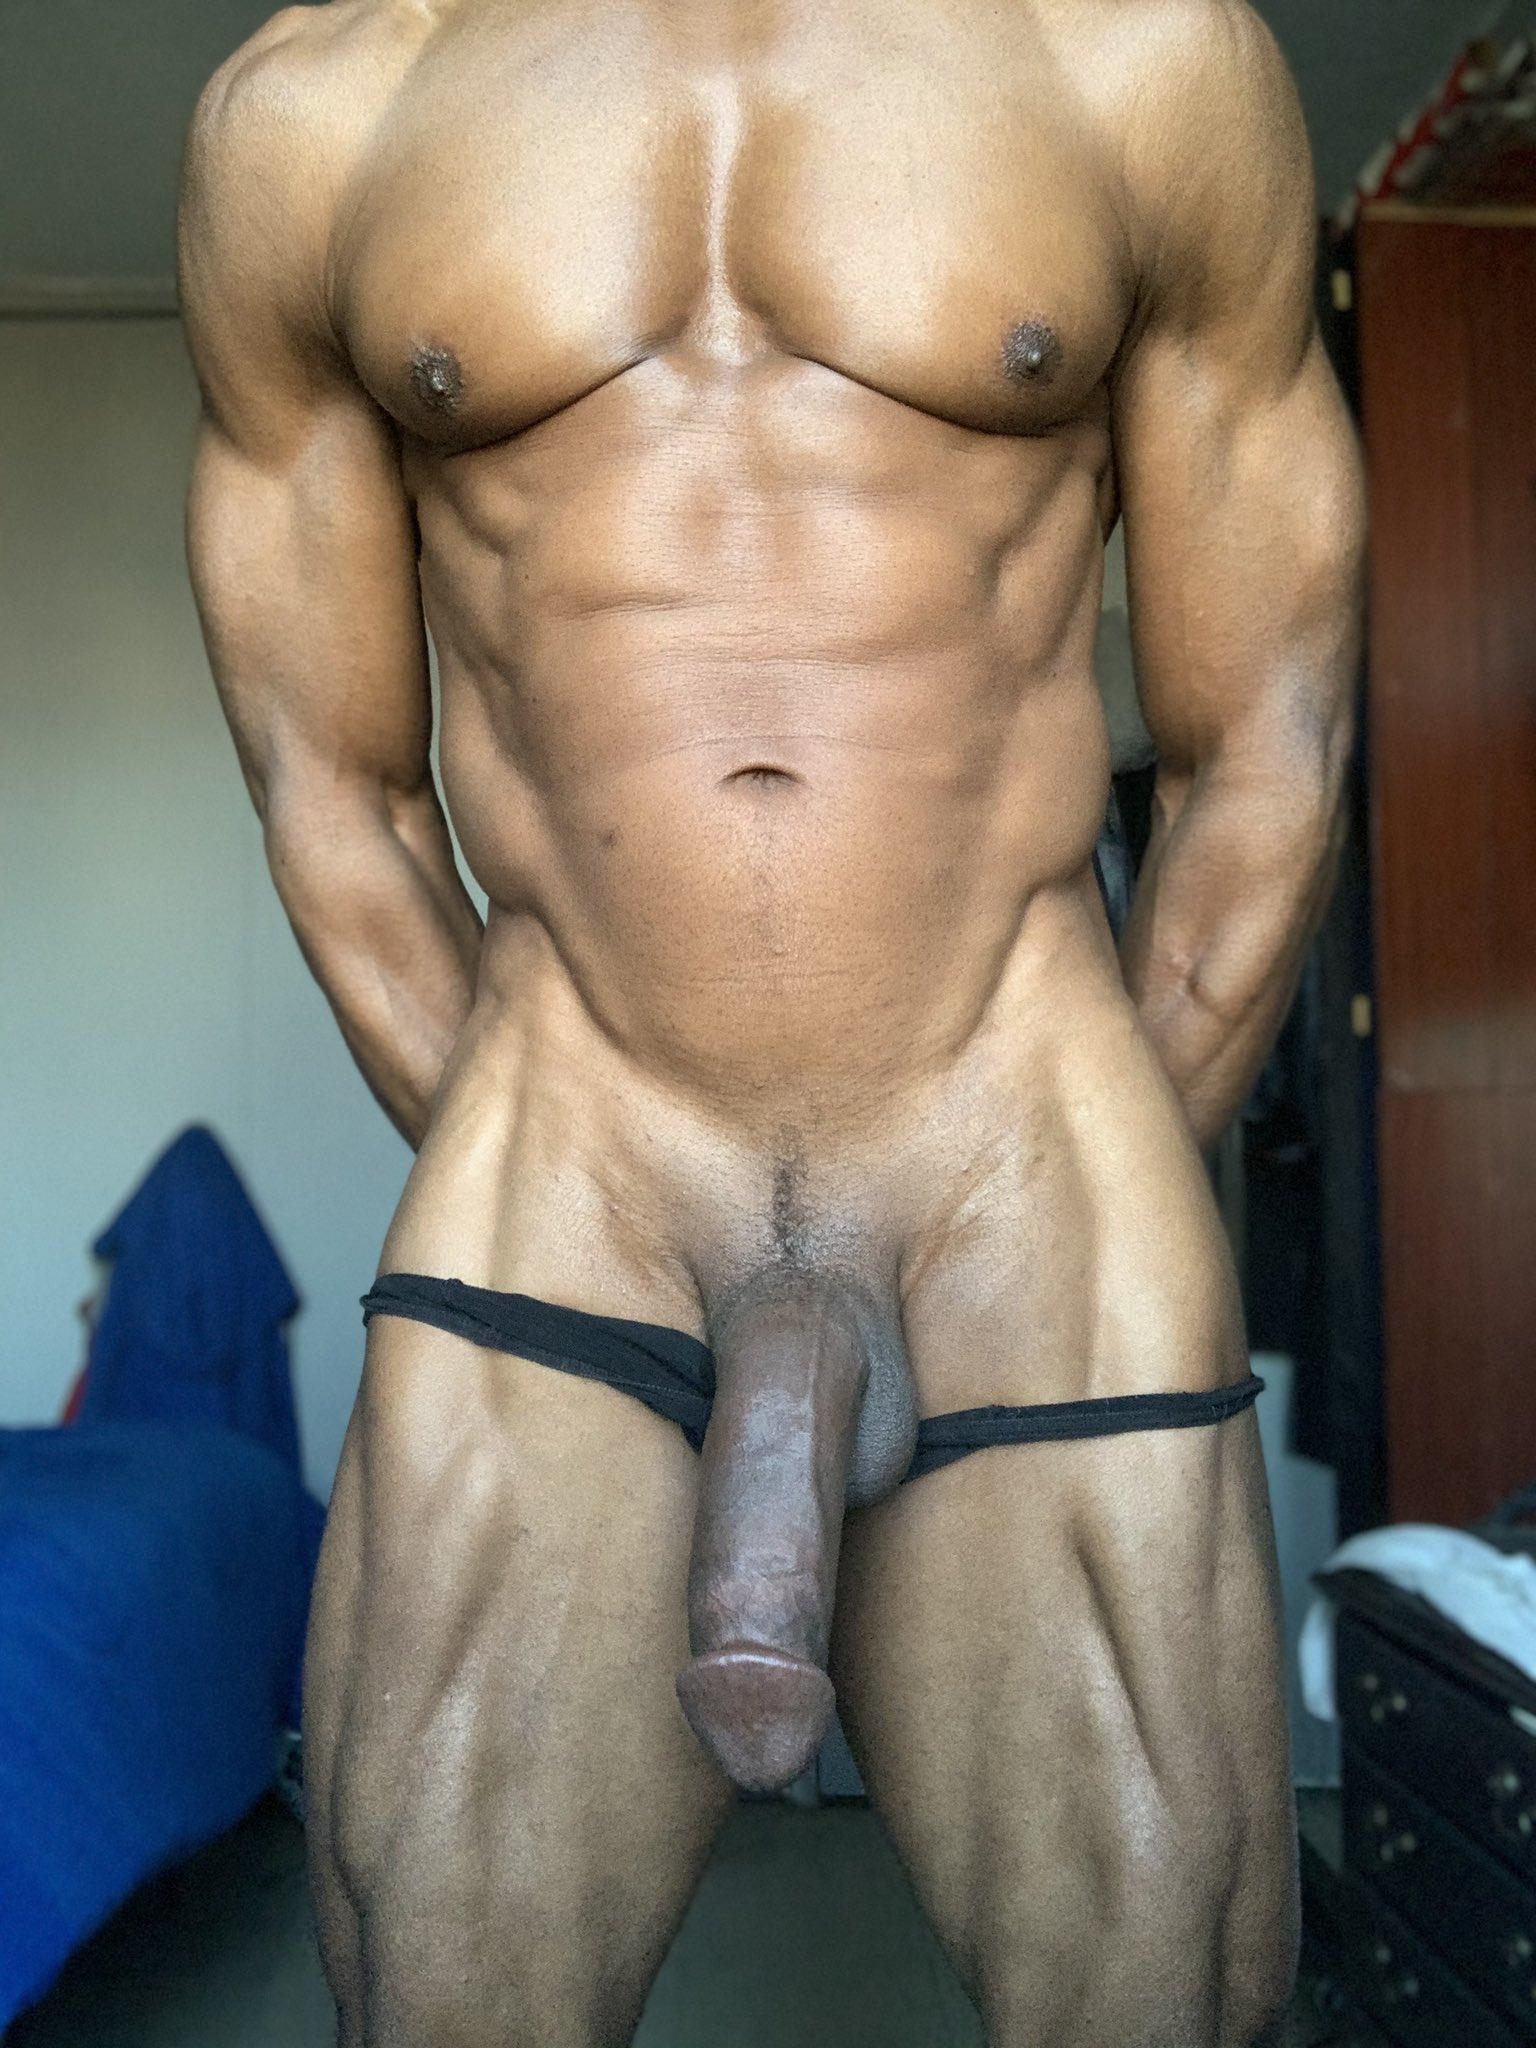 pene de hombre negro